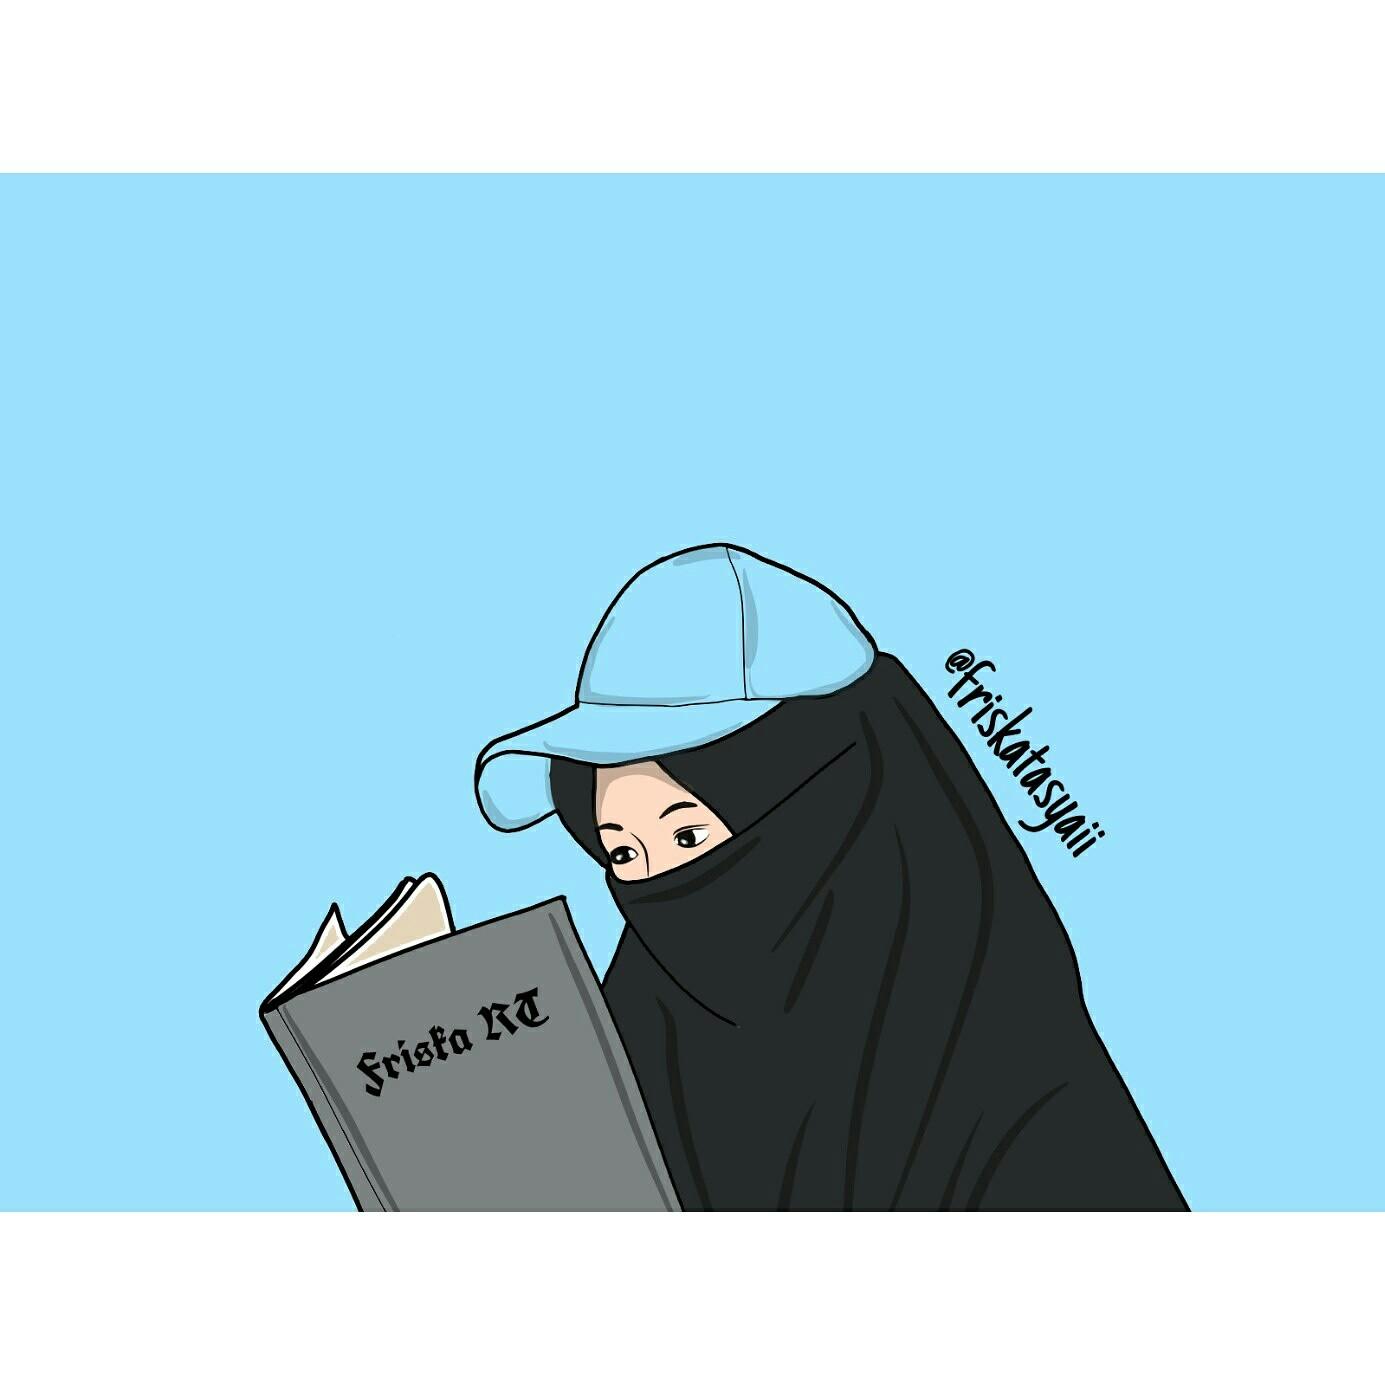 Gambar Kartun Muslimah Bercadar membaca Buku